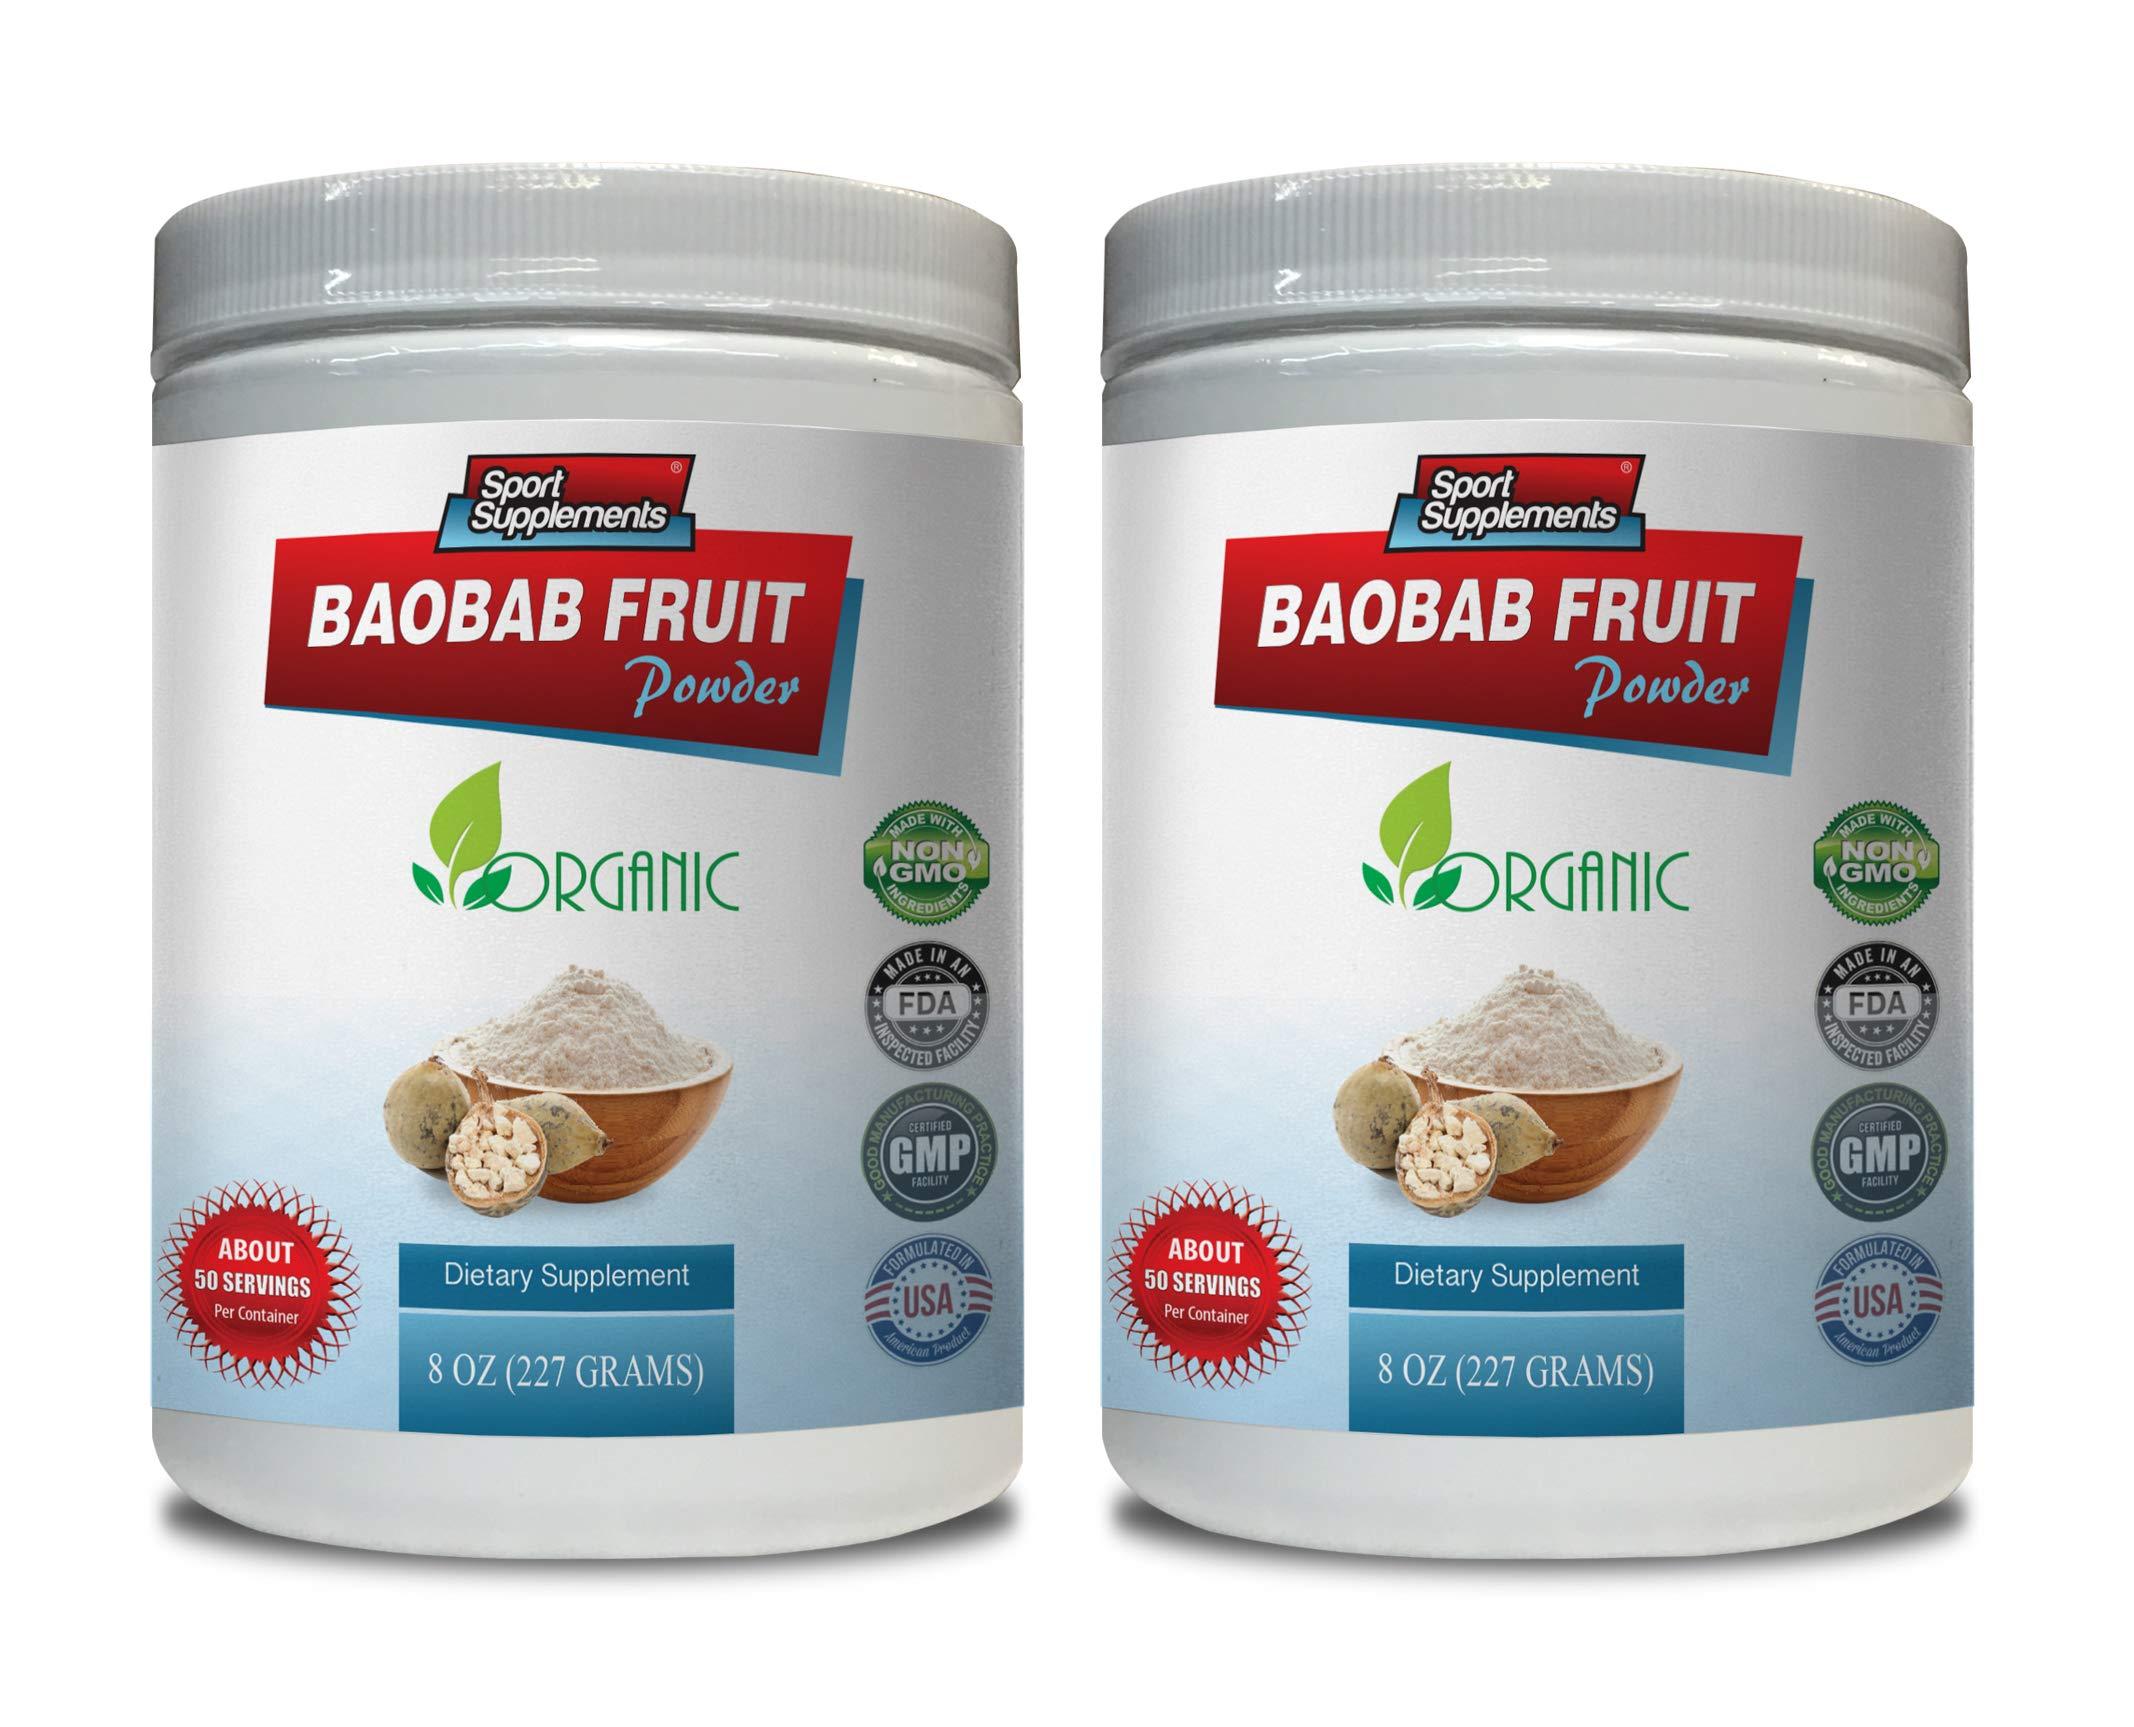 Anti-Aging Powder - Baobab Fruit Powder - Organic Dietary Supplement - orgamic Baobab Powder - 2 Cans 16 OZ (100 Servings)